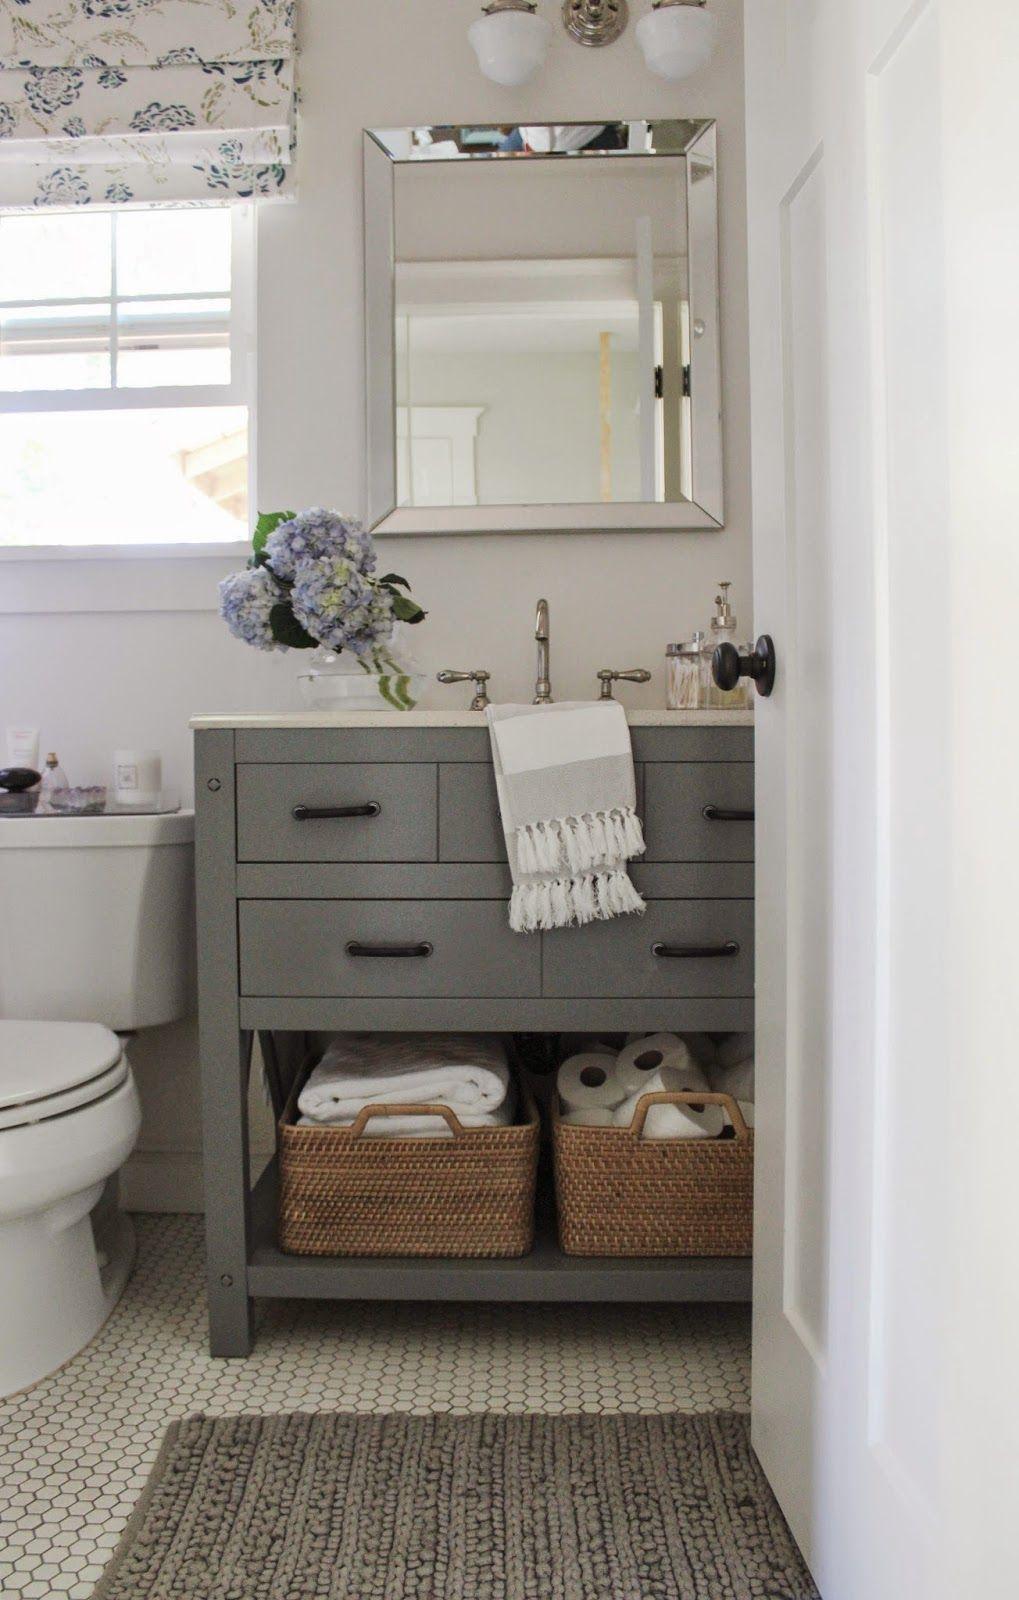 The Home Depot Diy Workshop: Vertical Planter Our Bathroom Vanity Changeup  London Is